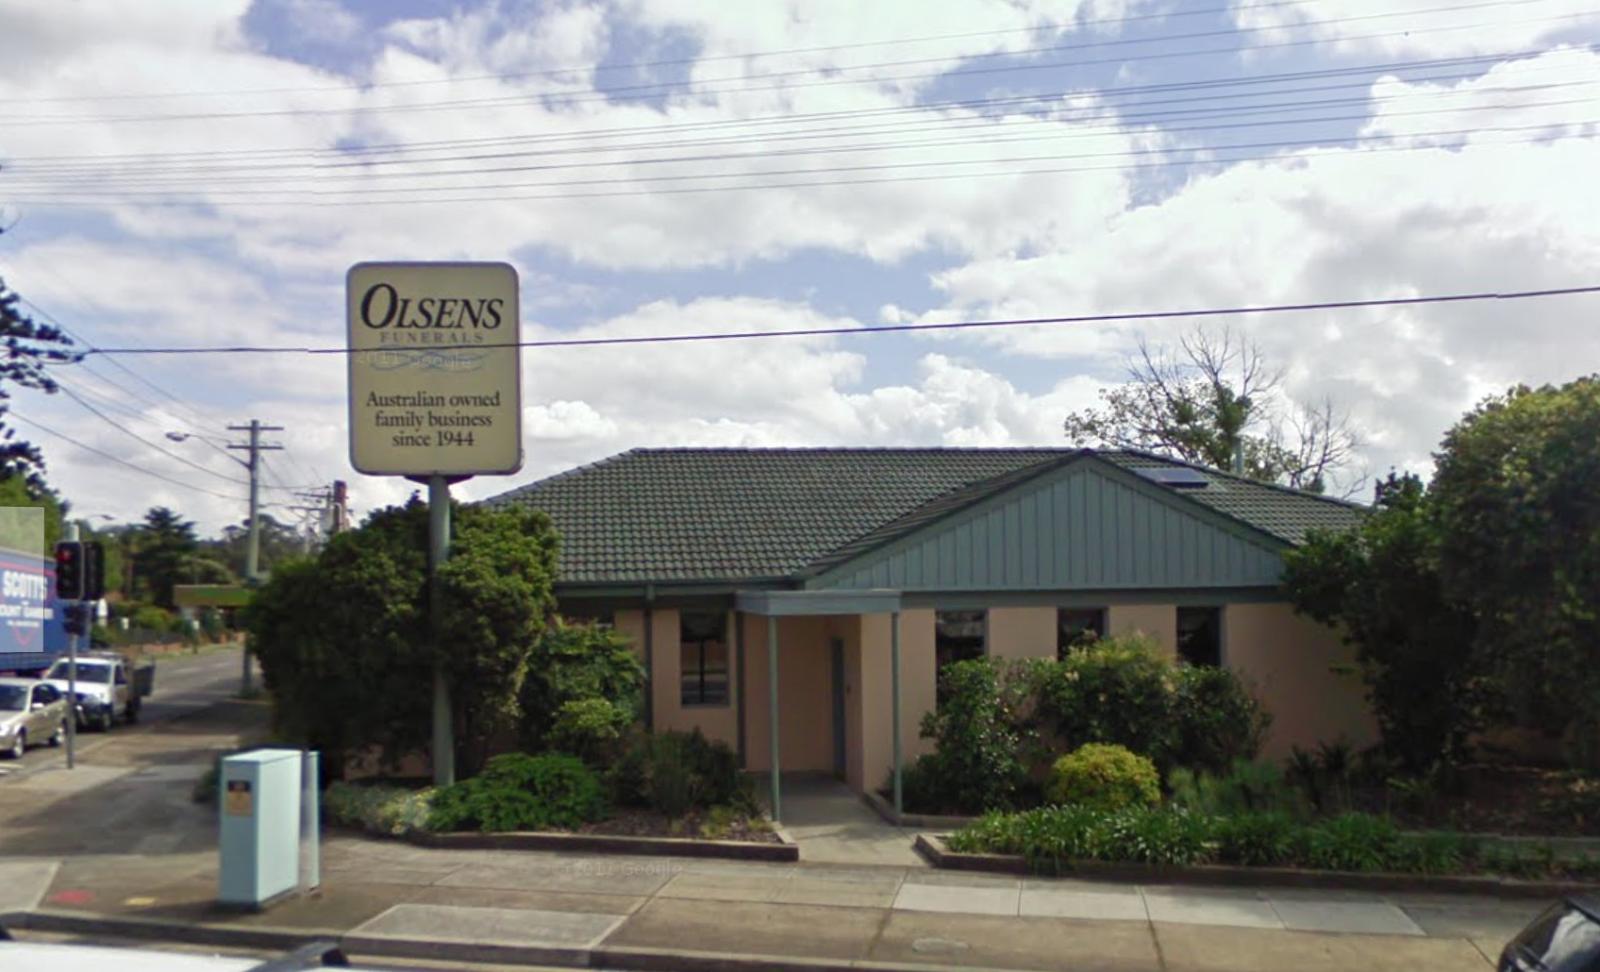 olsens funeral home